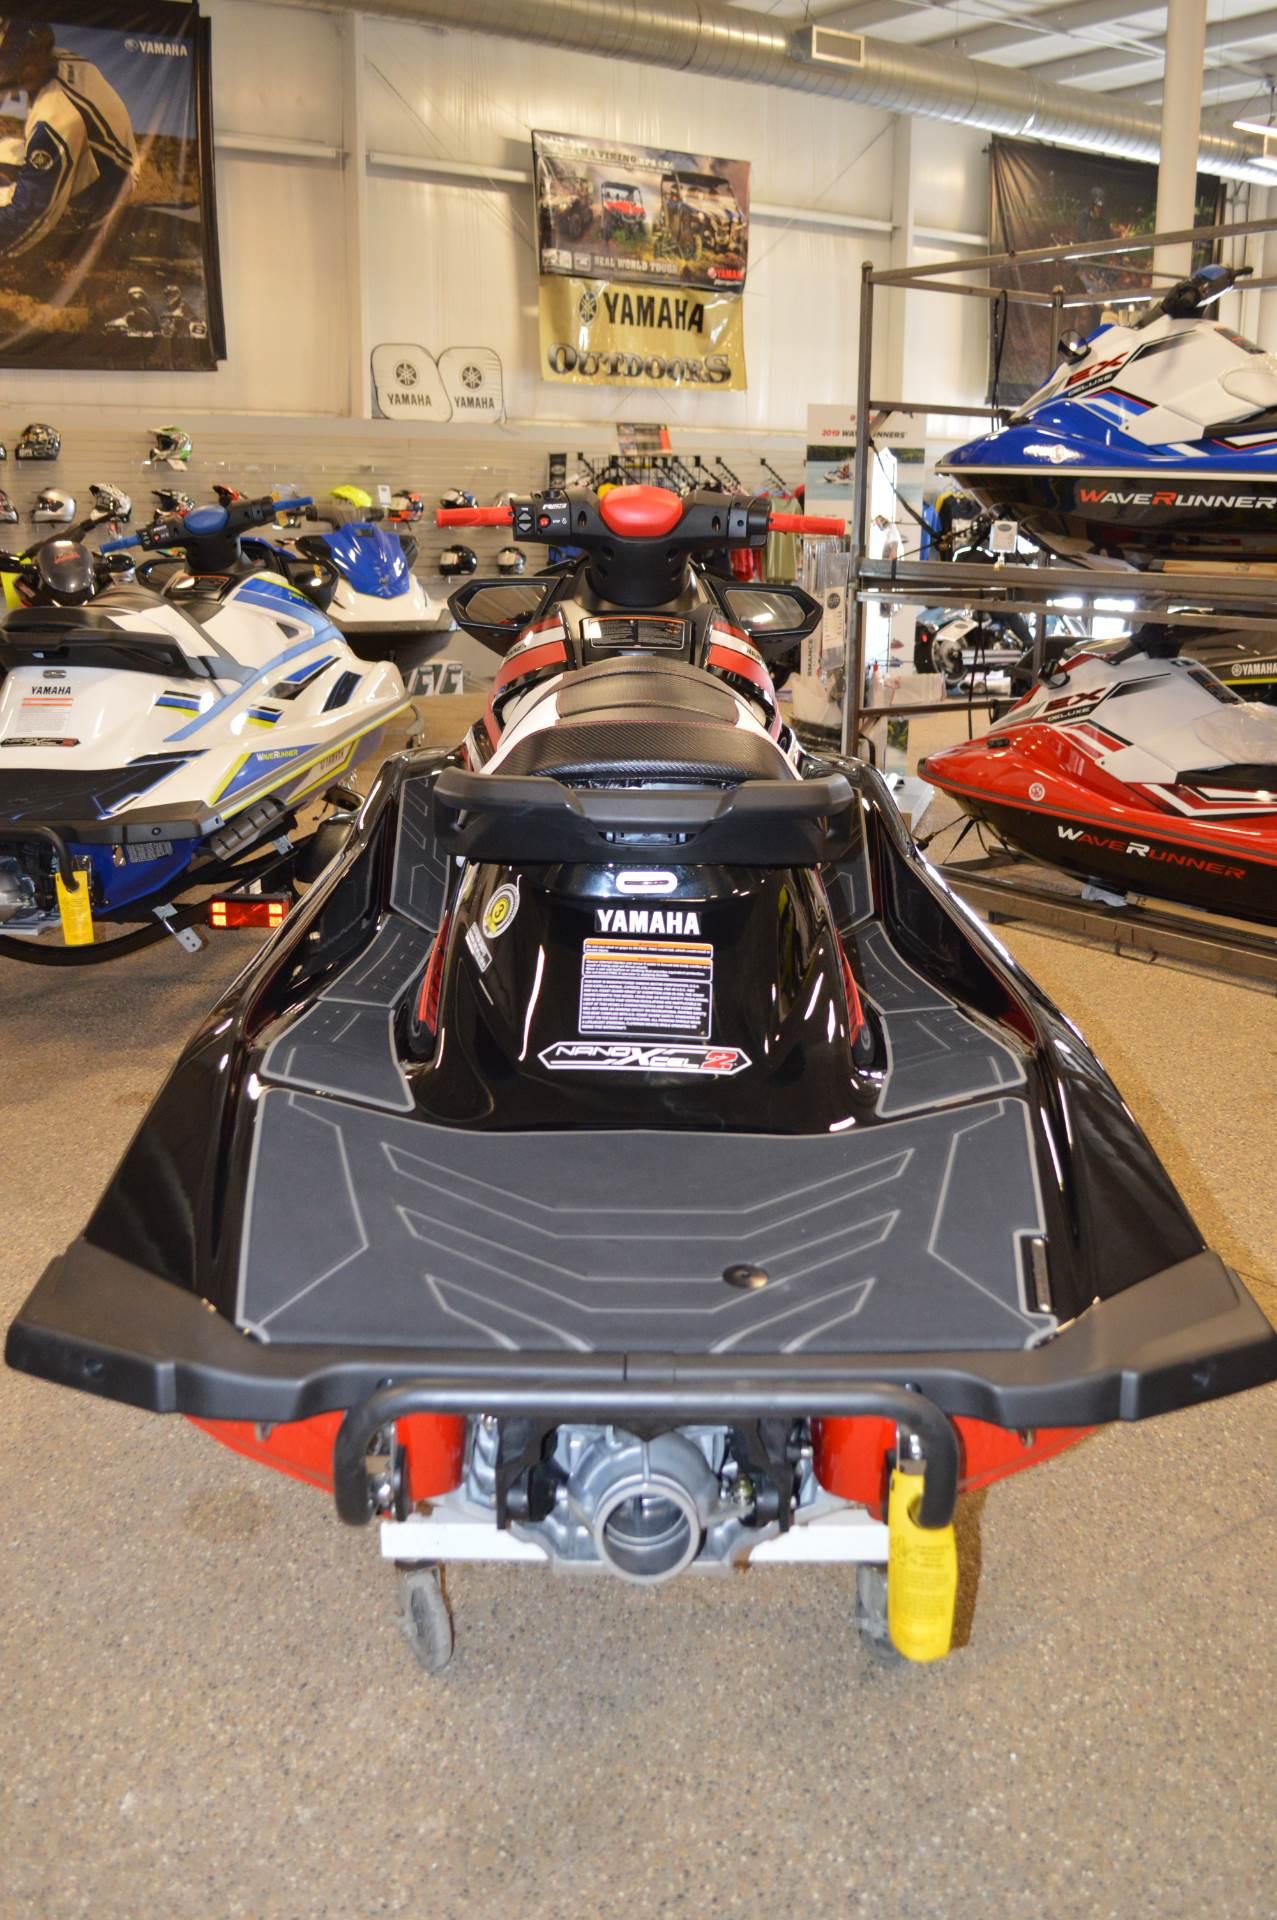 2019 Yamaha GP1800R 3